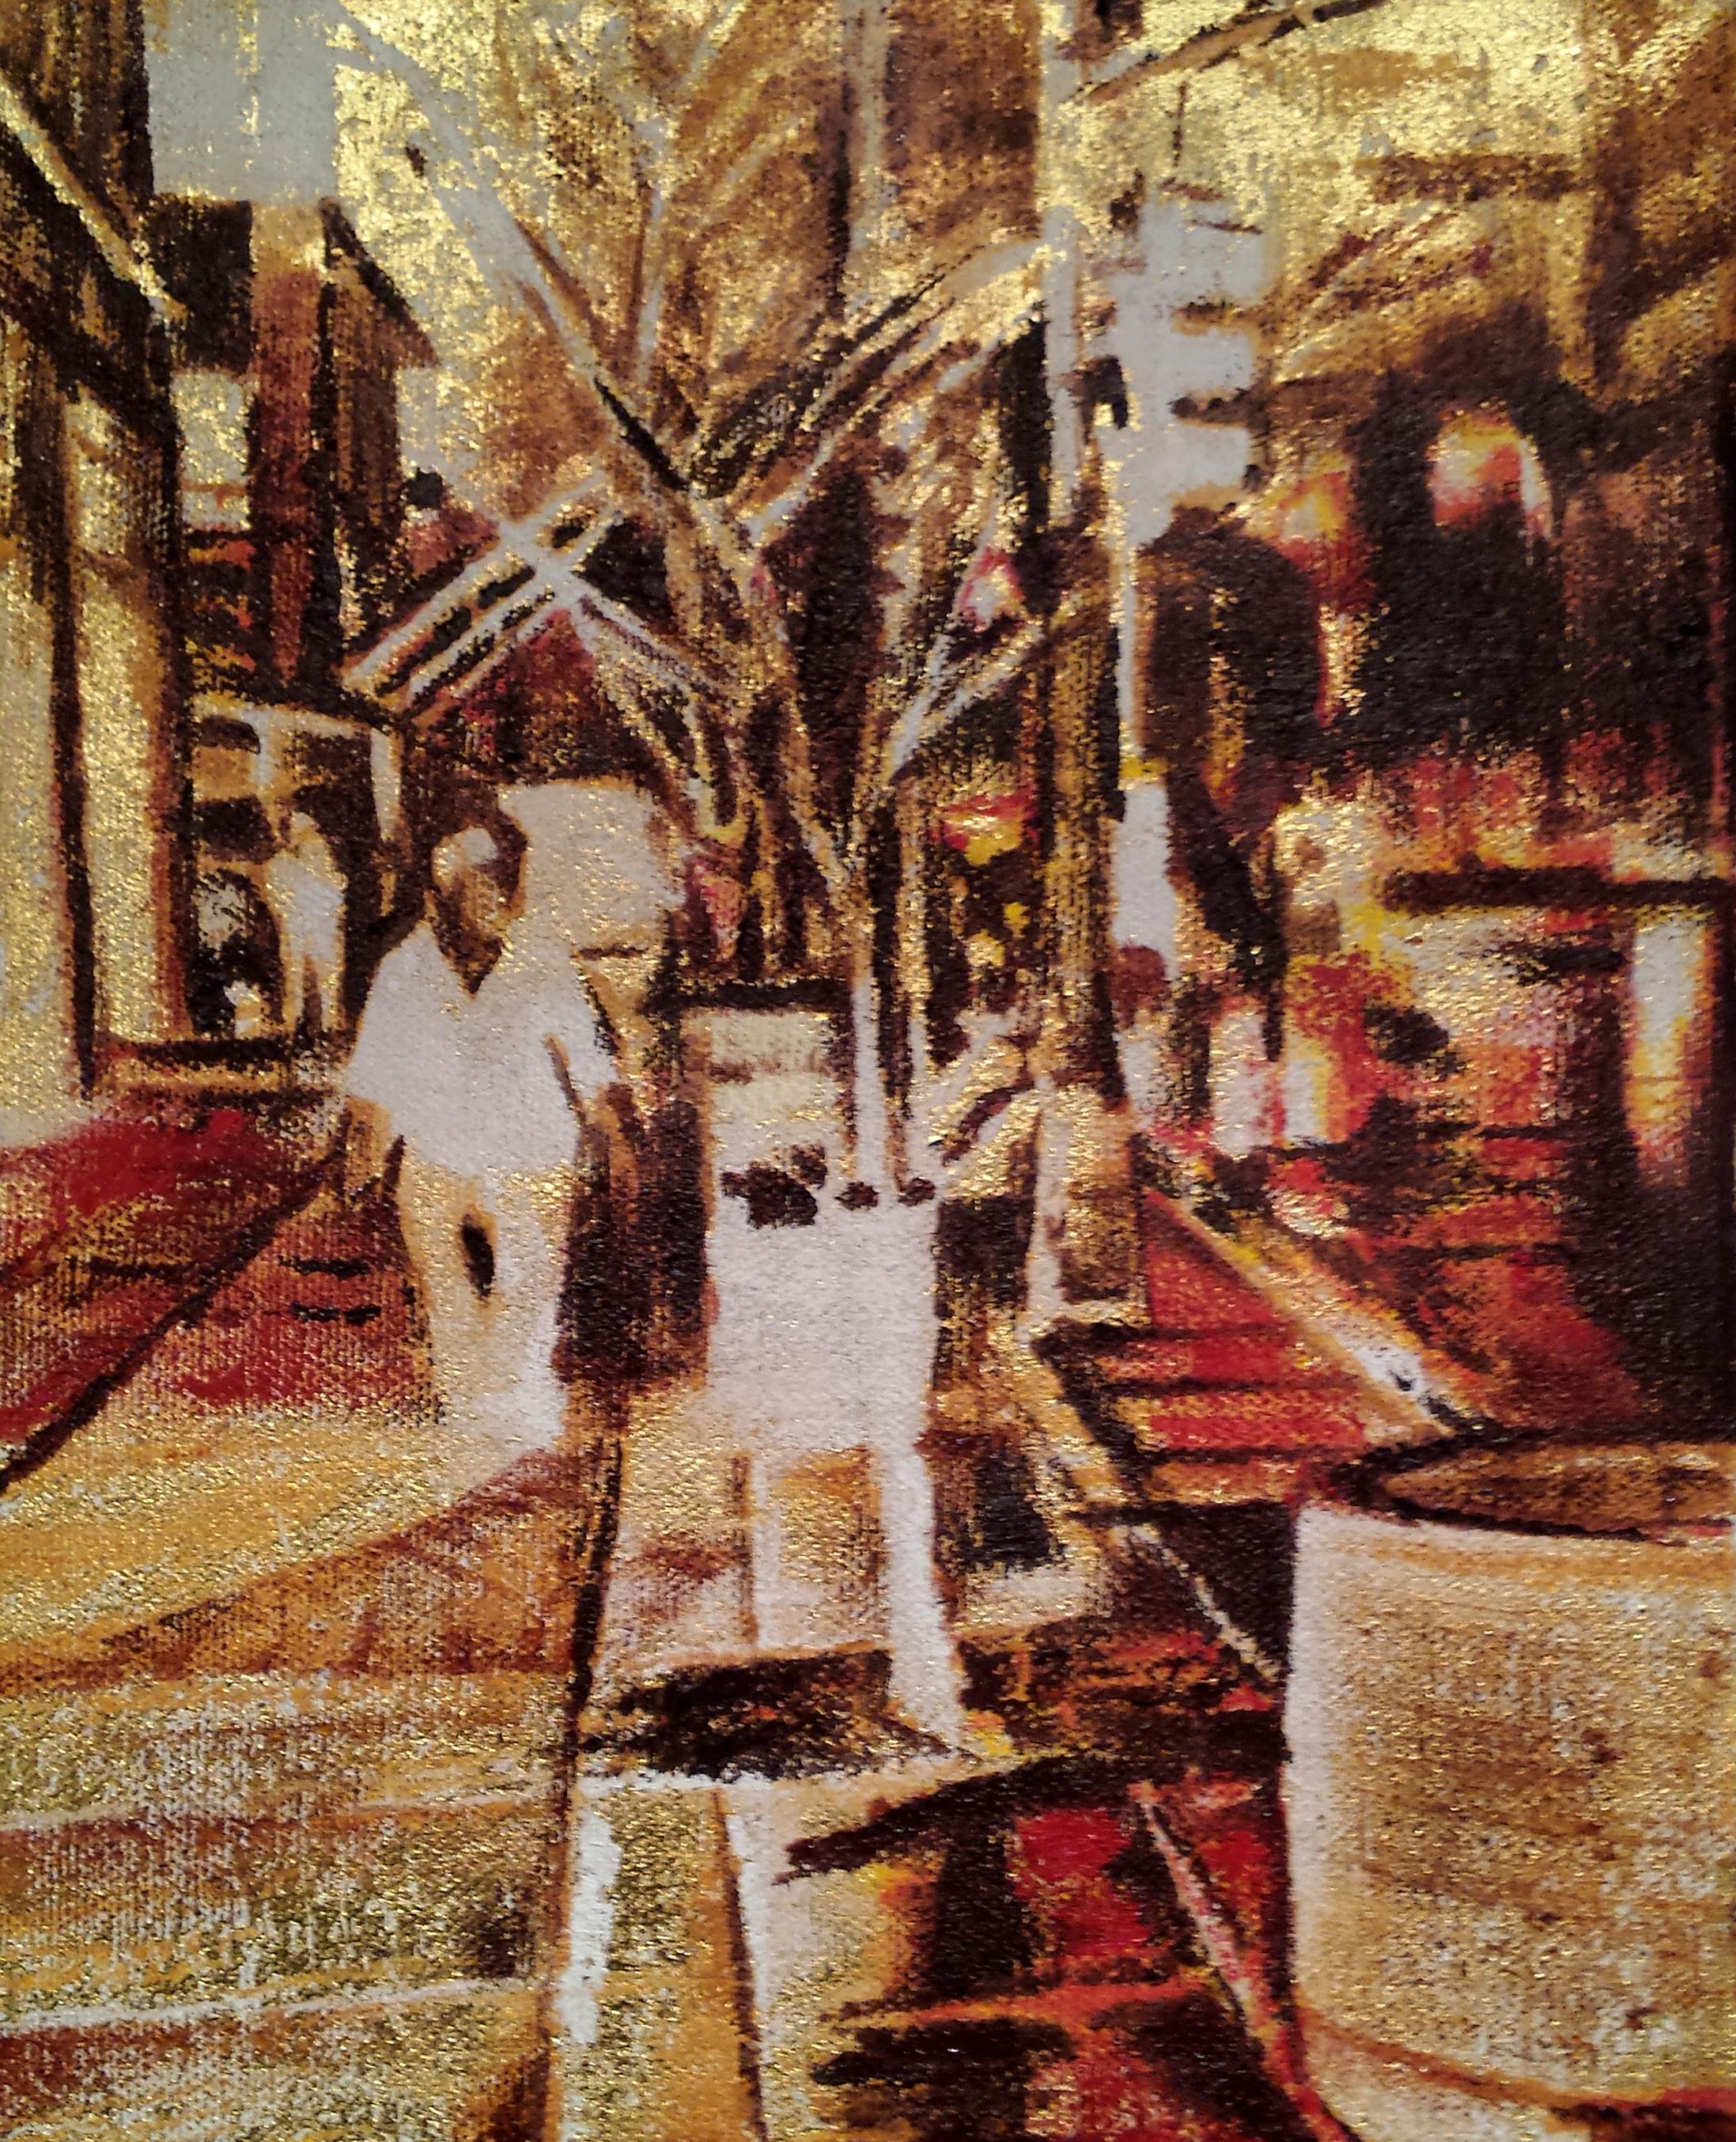 """Alchemy"" Adam Chapman oil, 23k Gold on canvas 10""x8"" 2016"